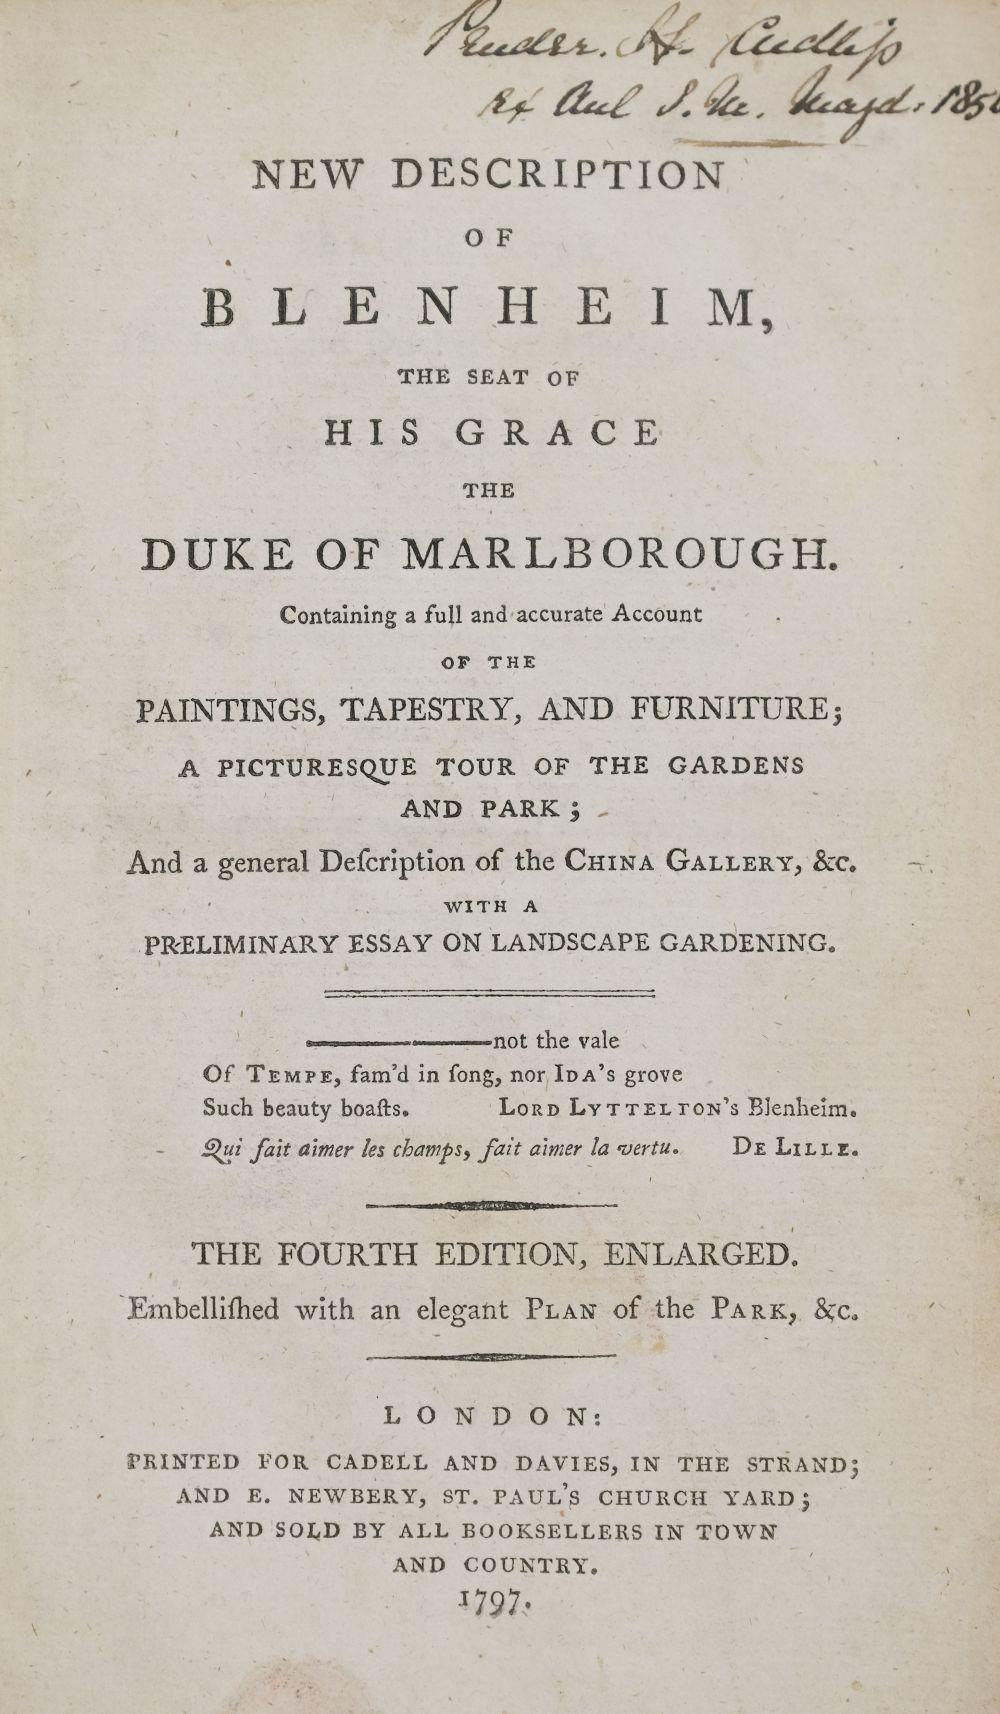 Mavor (William). New Description of Blenheim, the seat of His Grace the Duke of Marlborough, 1797